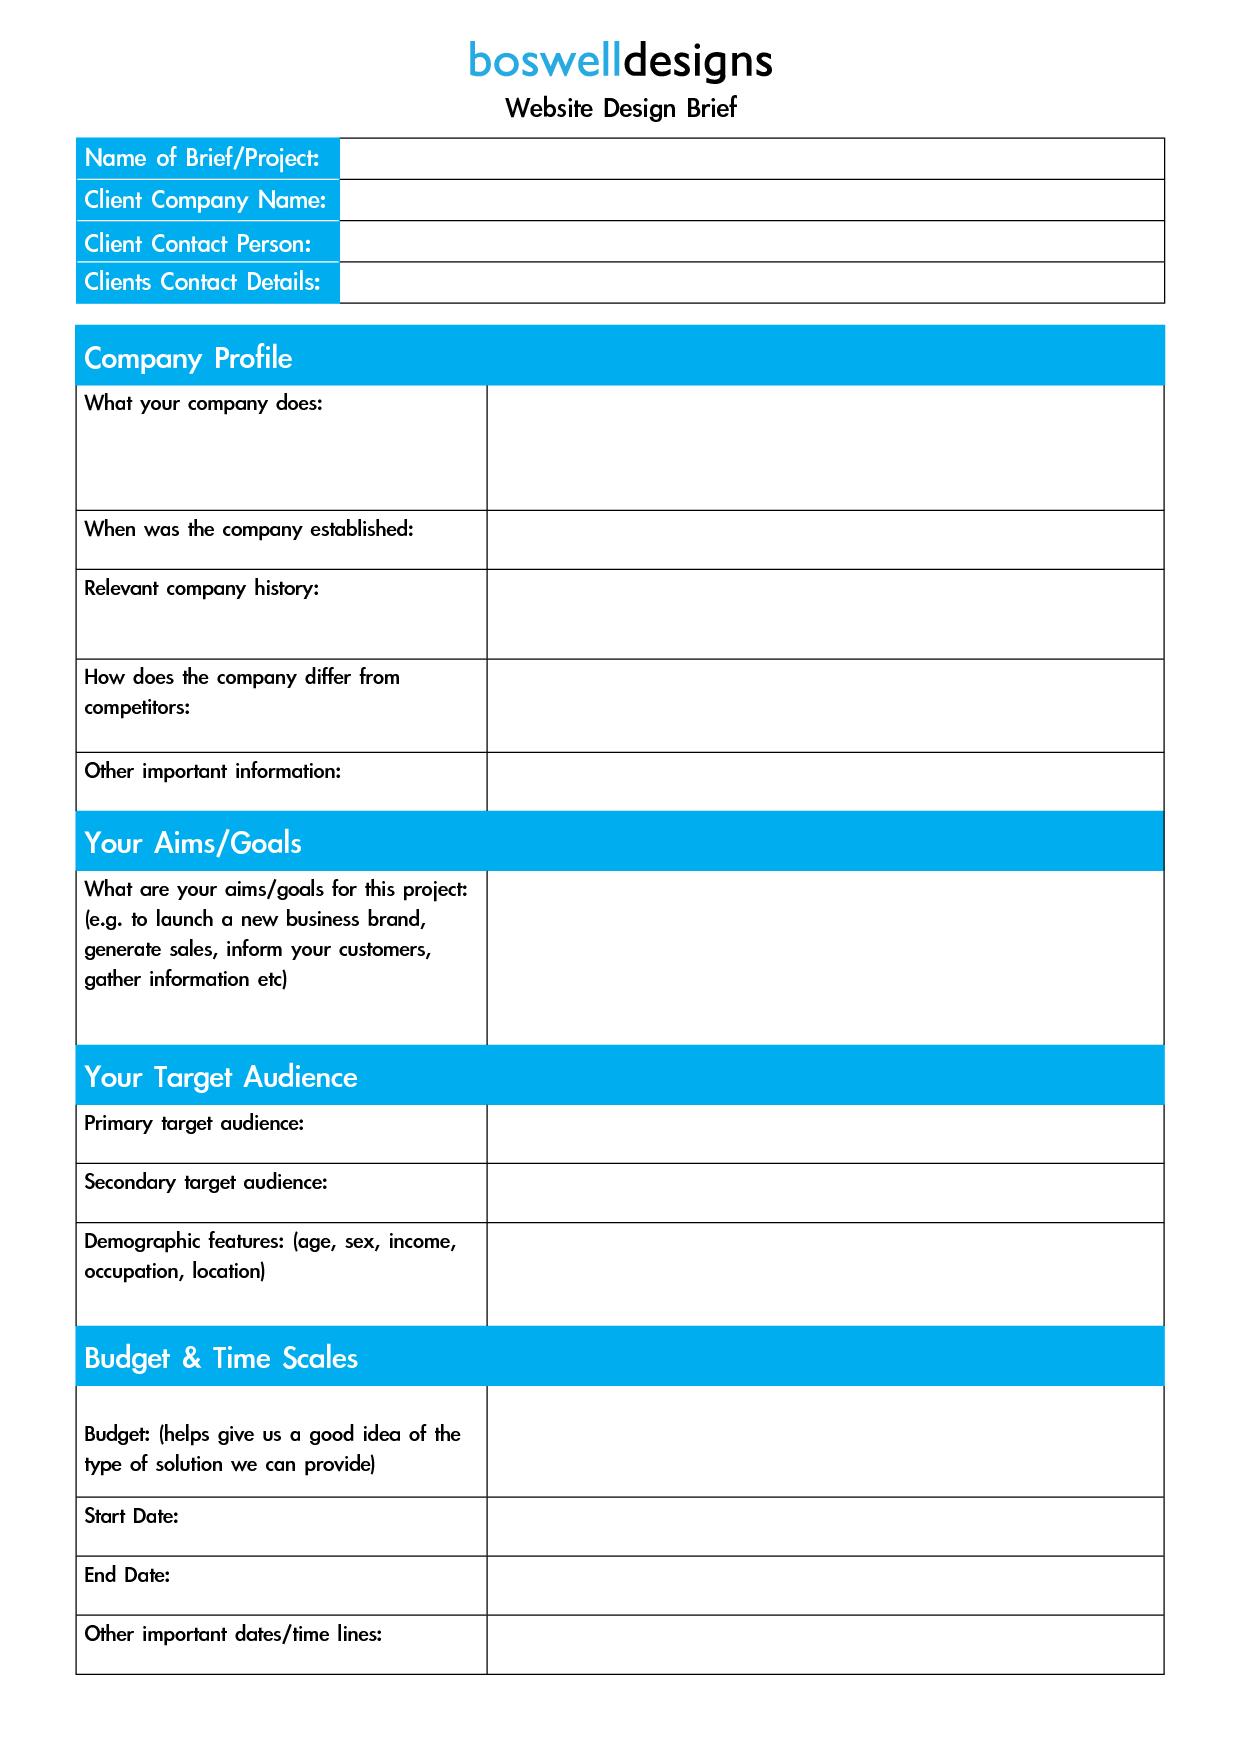 Website Design Brief Template Google Search Creative Brief Template Design Brief Template Business Card Template Design